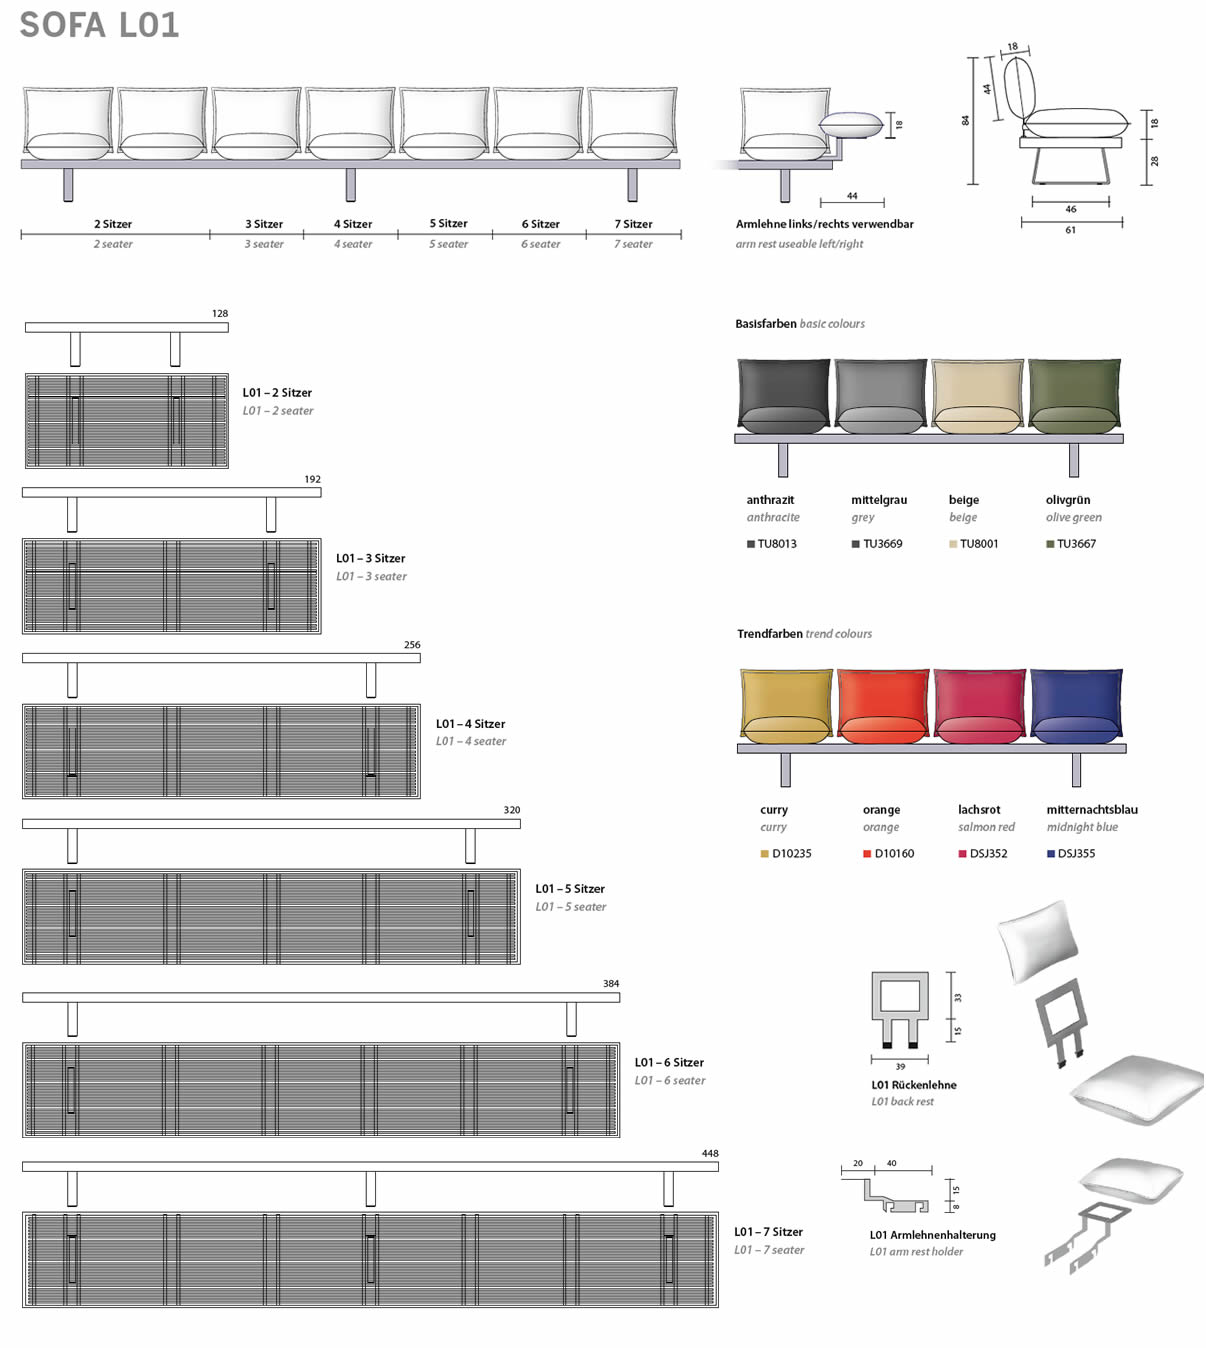 volkerweiss-outdoor-sofa-abmessungen